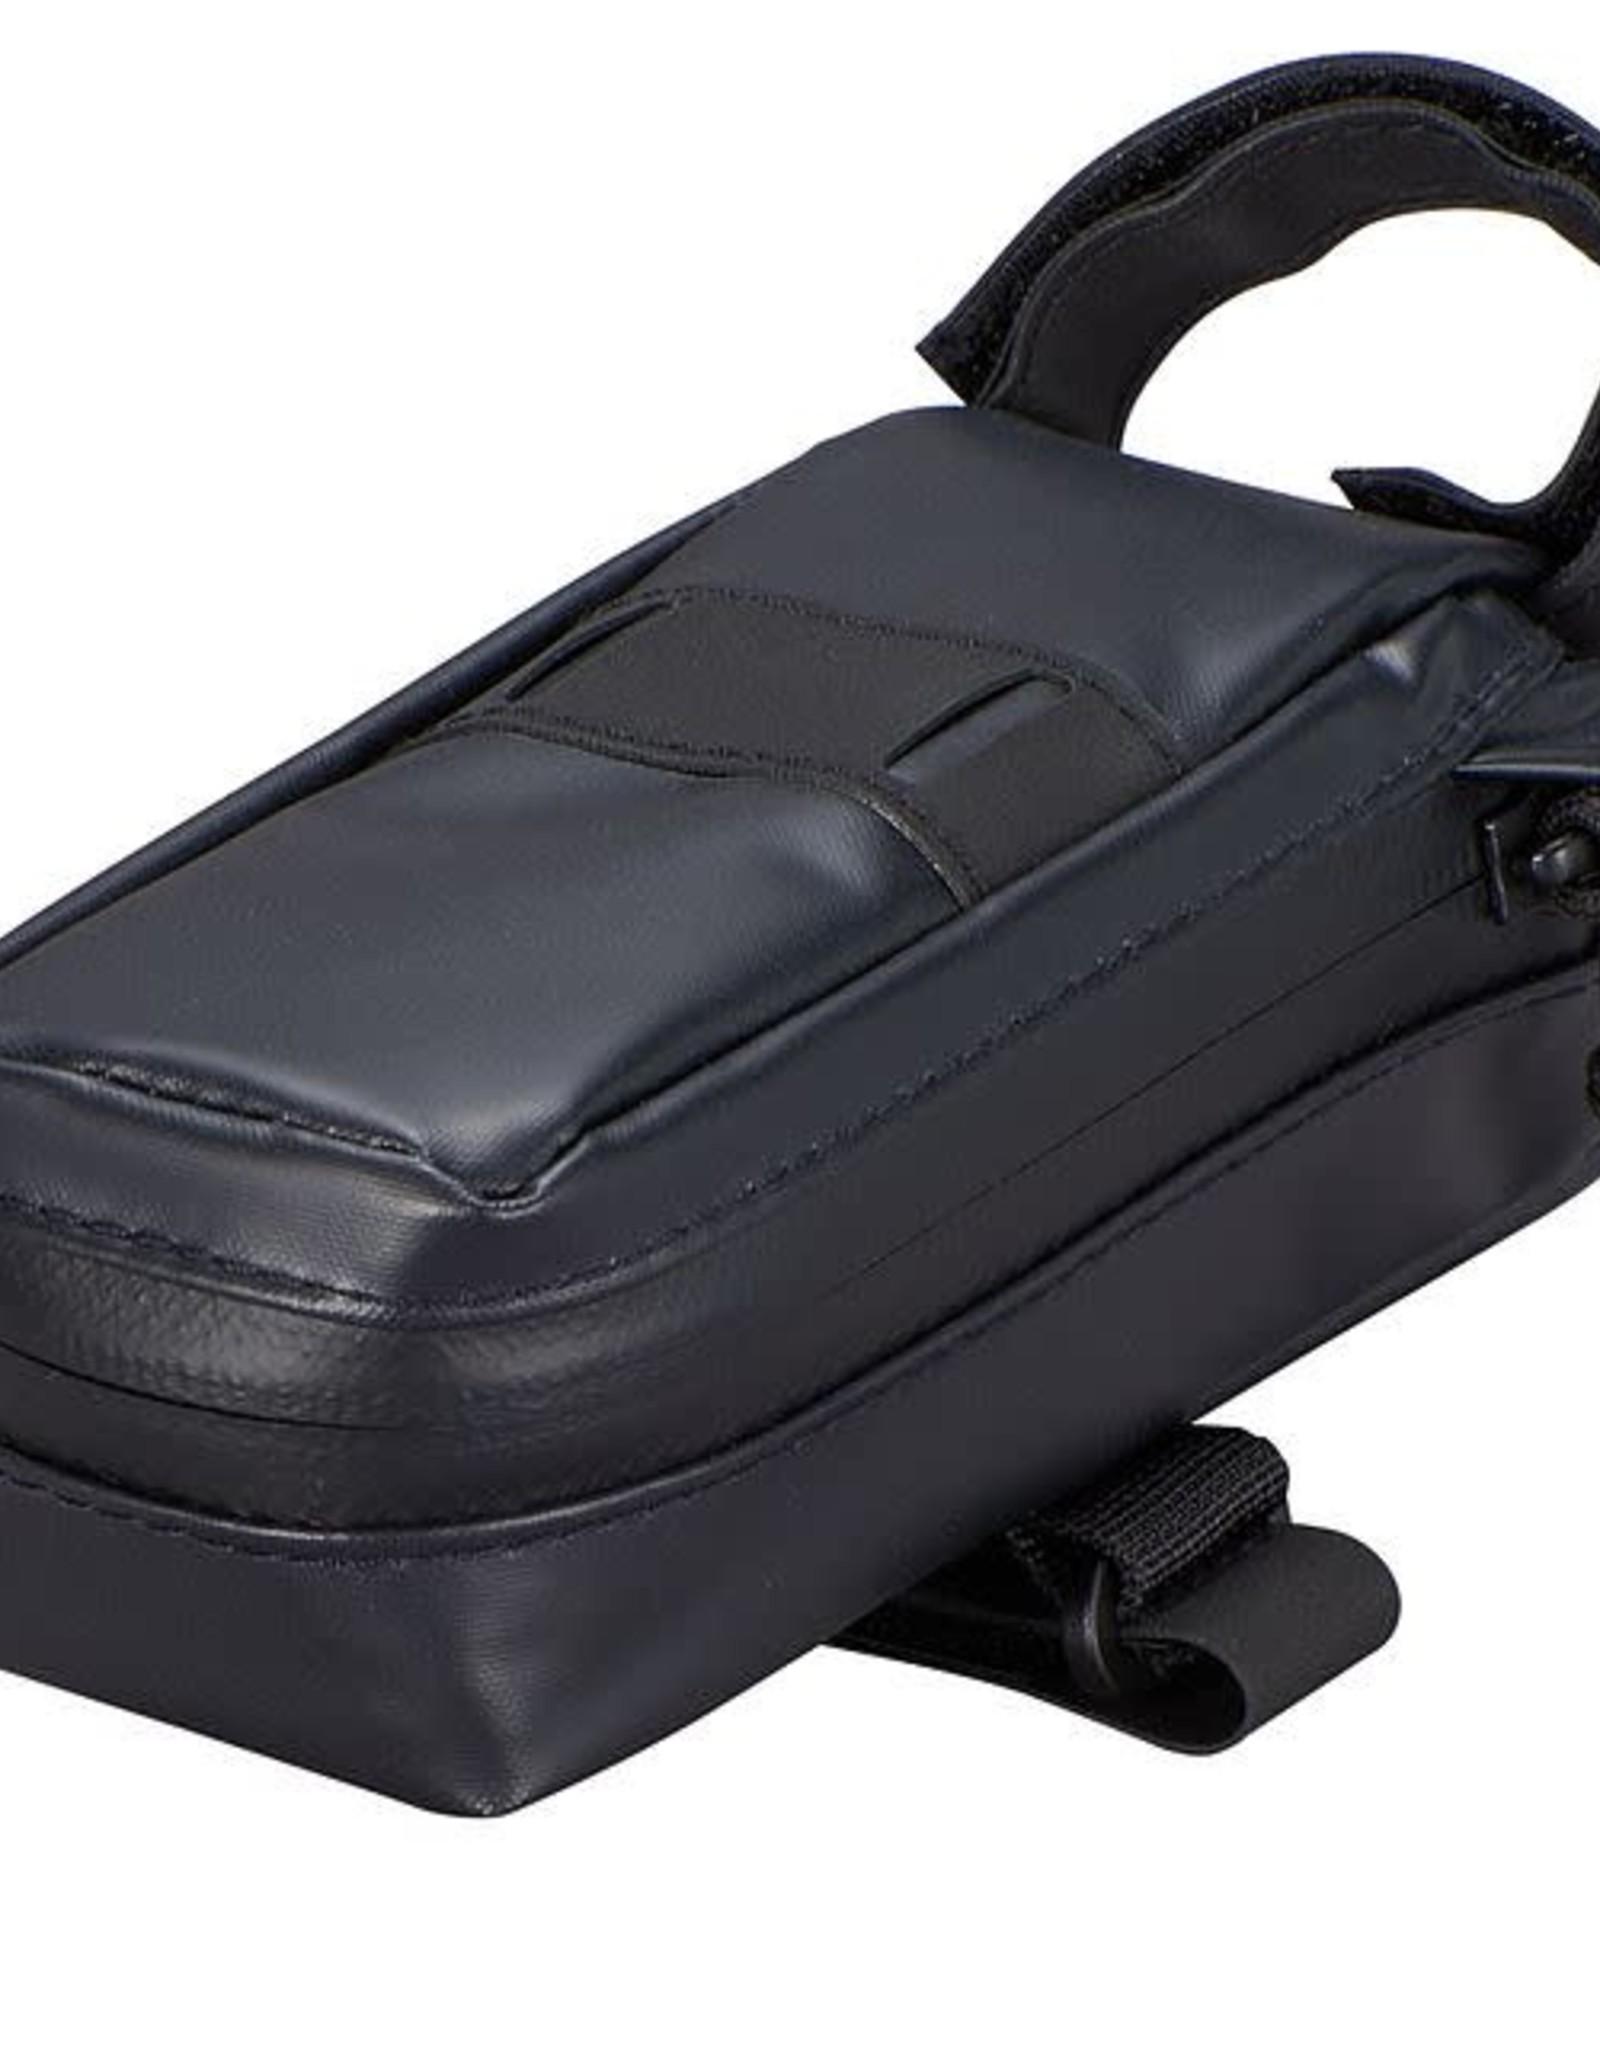 SPECIALIZED Specialized WEDGIE SEAT BAG Black